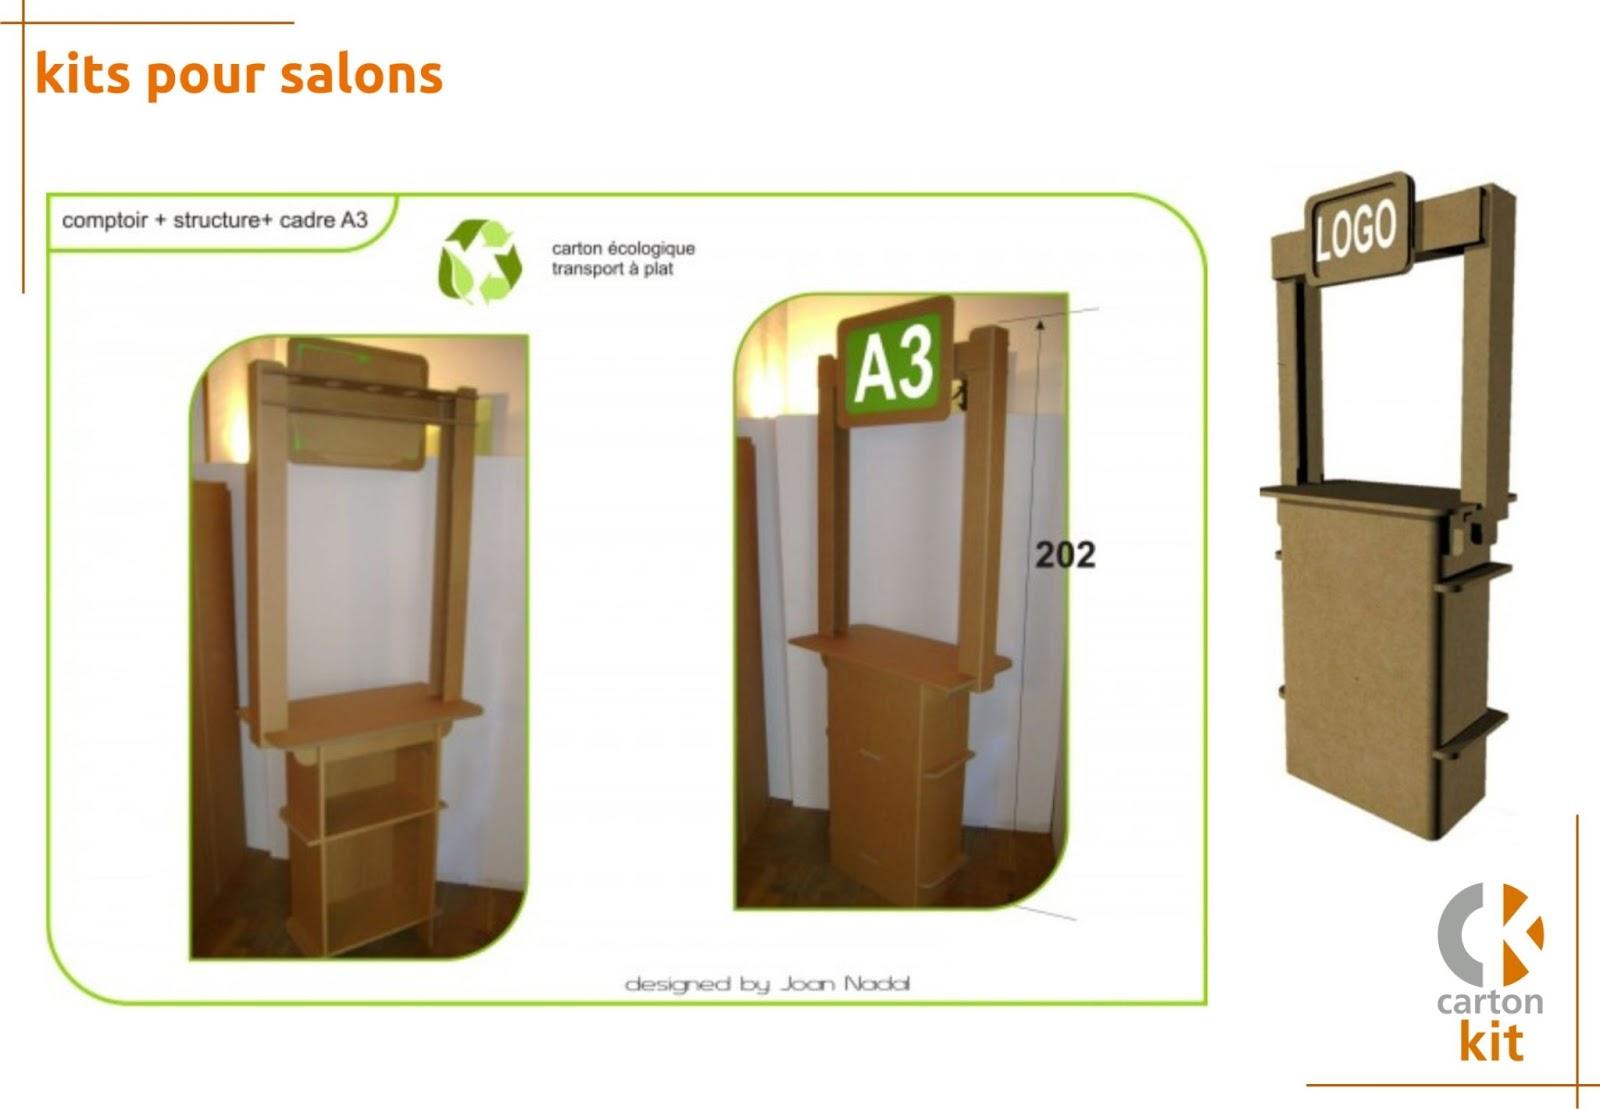 carton kit cr ations objets et meubles 100 carton stand carton. Black Bedroom Furniture Sets. Home Design Ideas